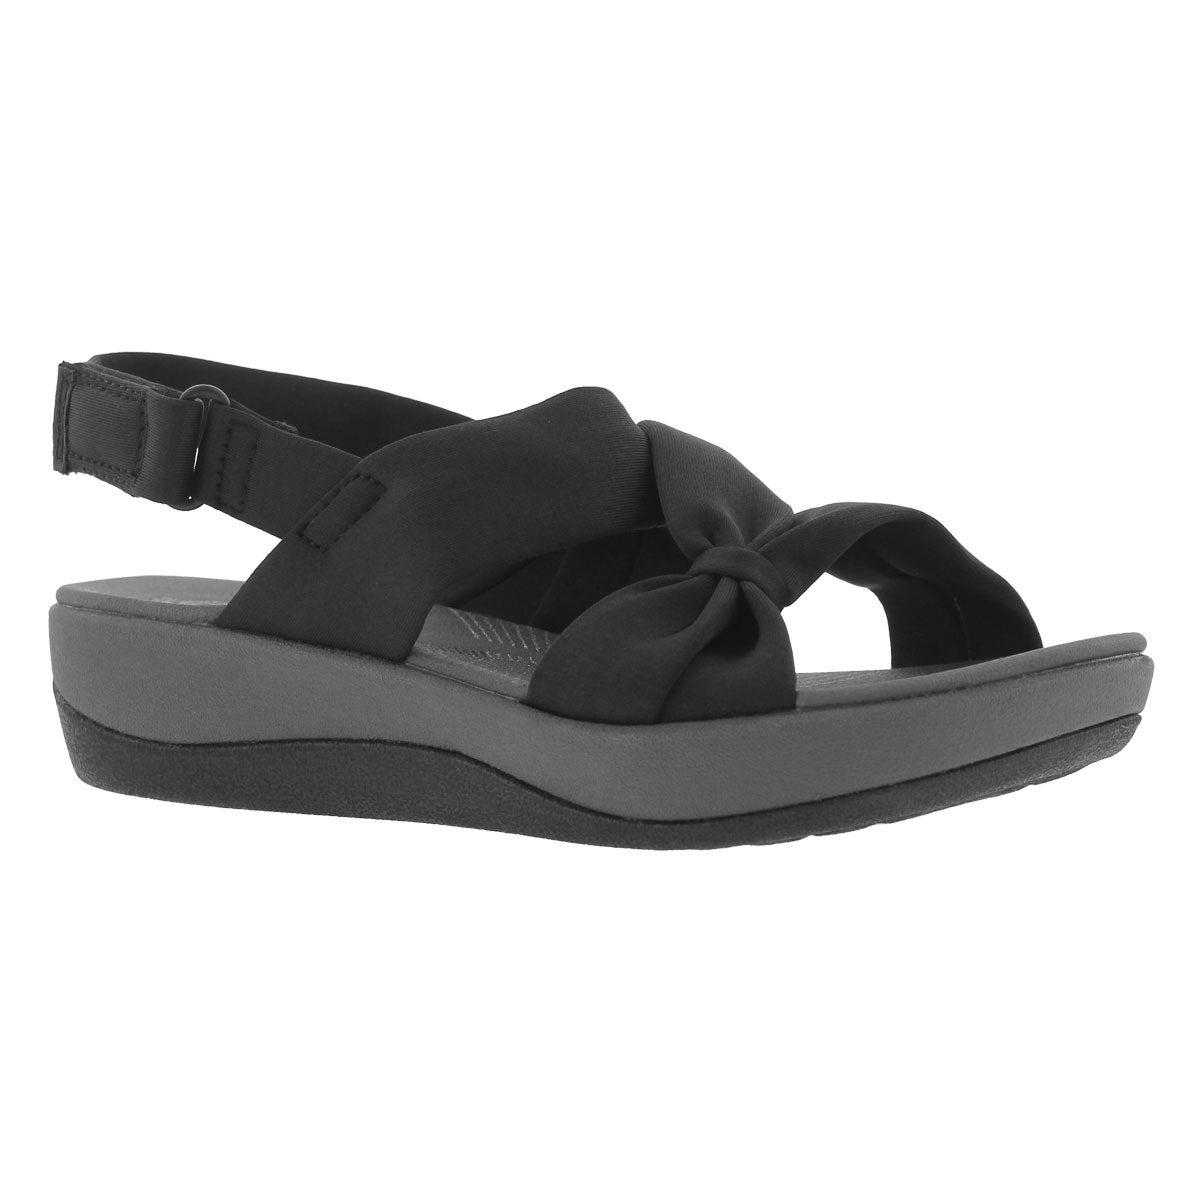 Women's ARLA PRIMROSE black wedge sandals